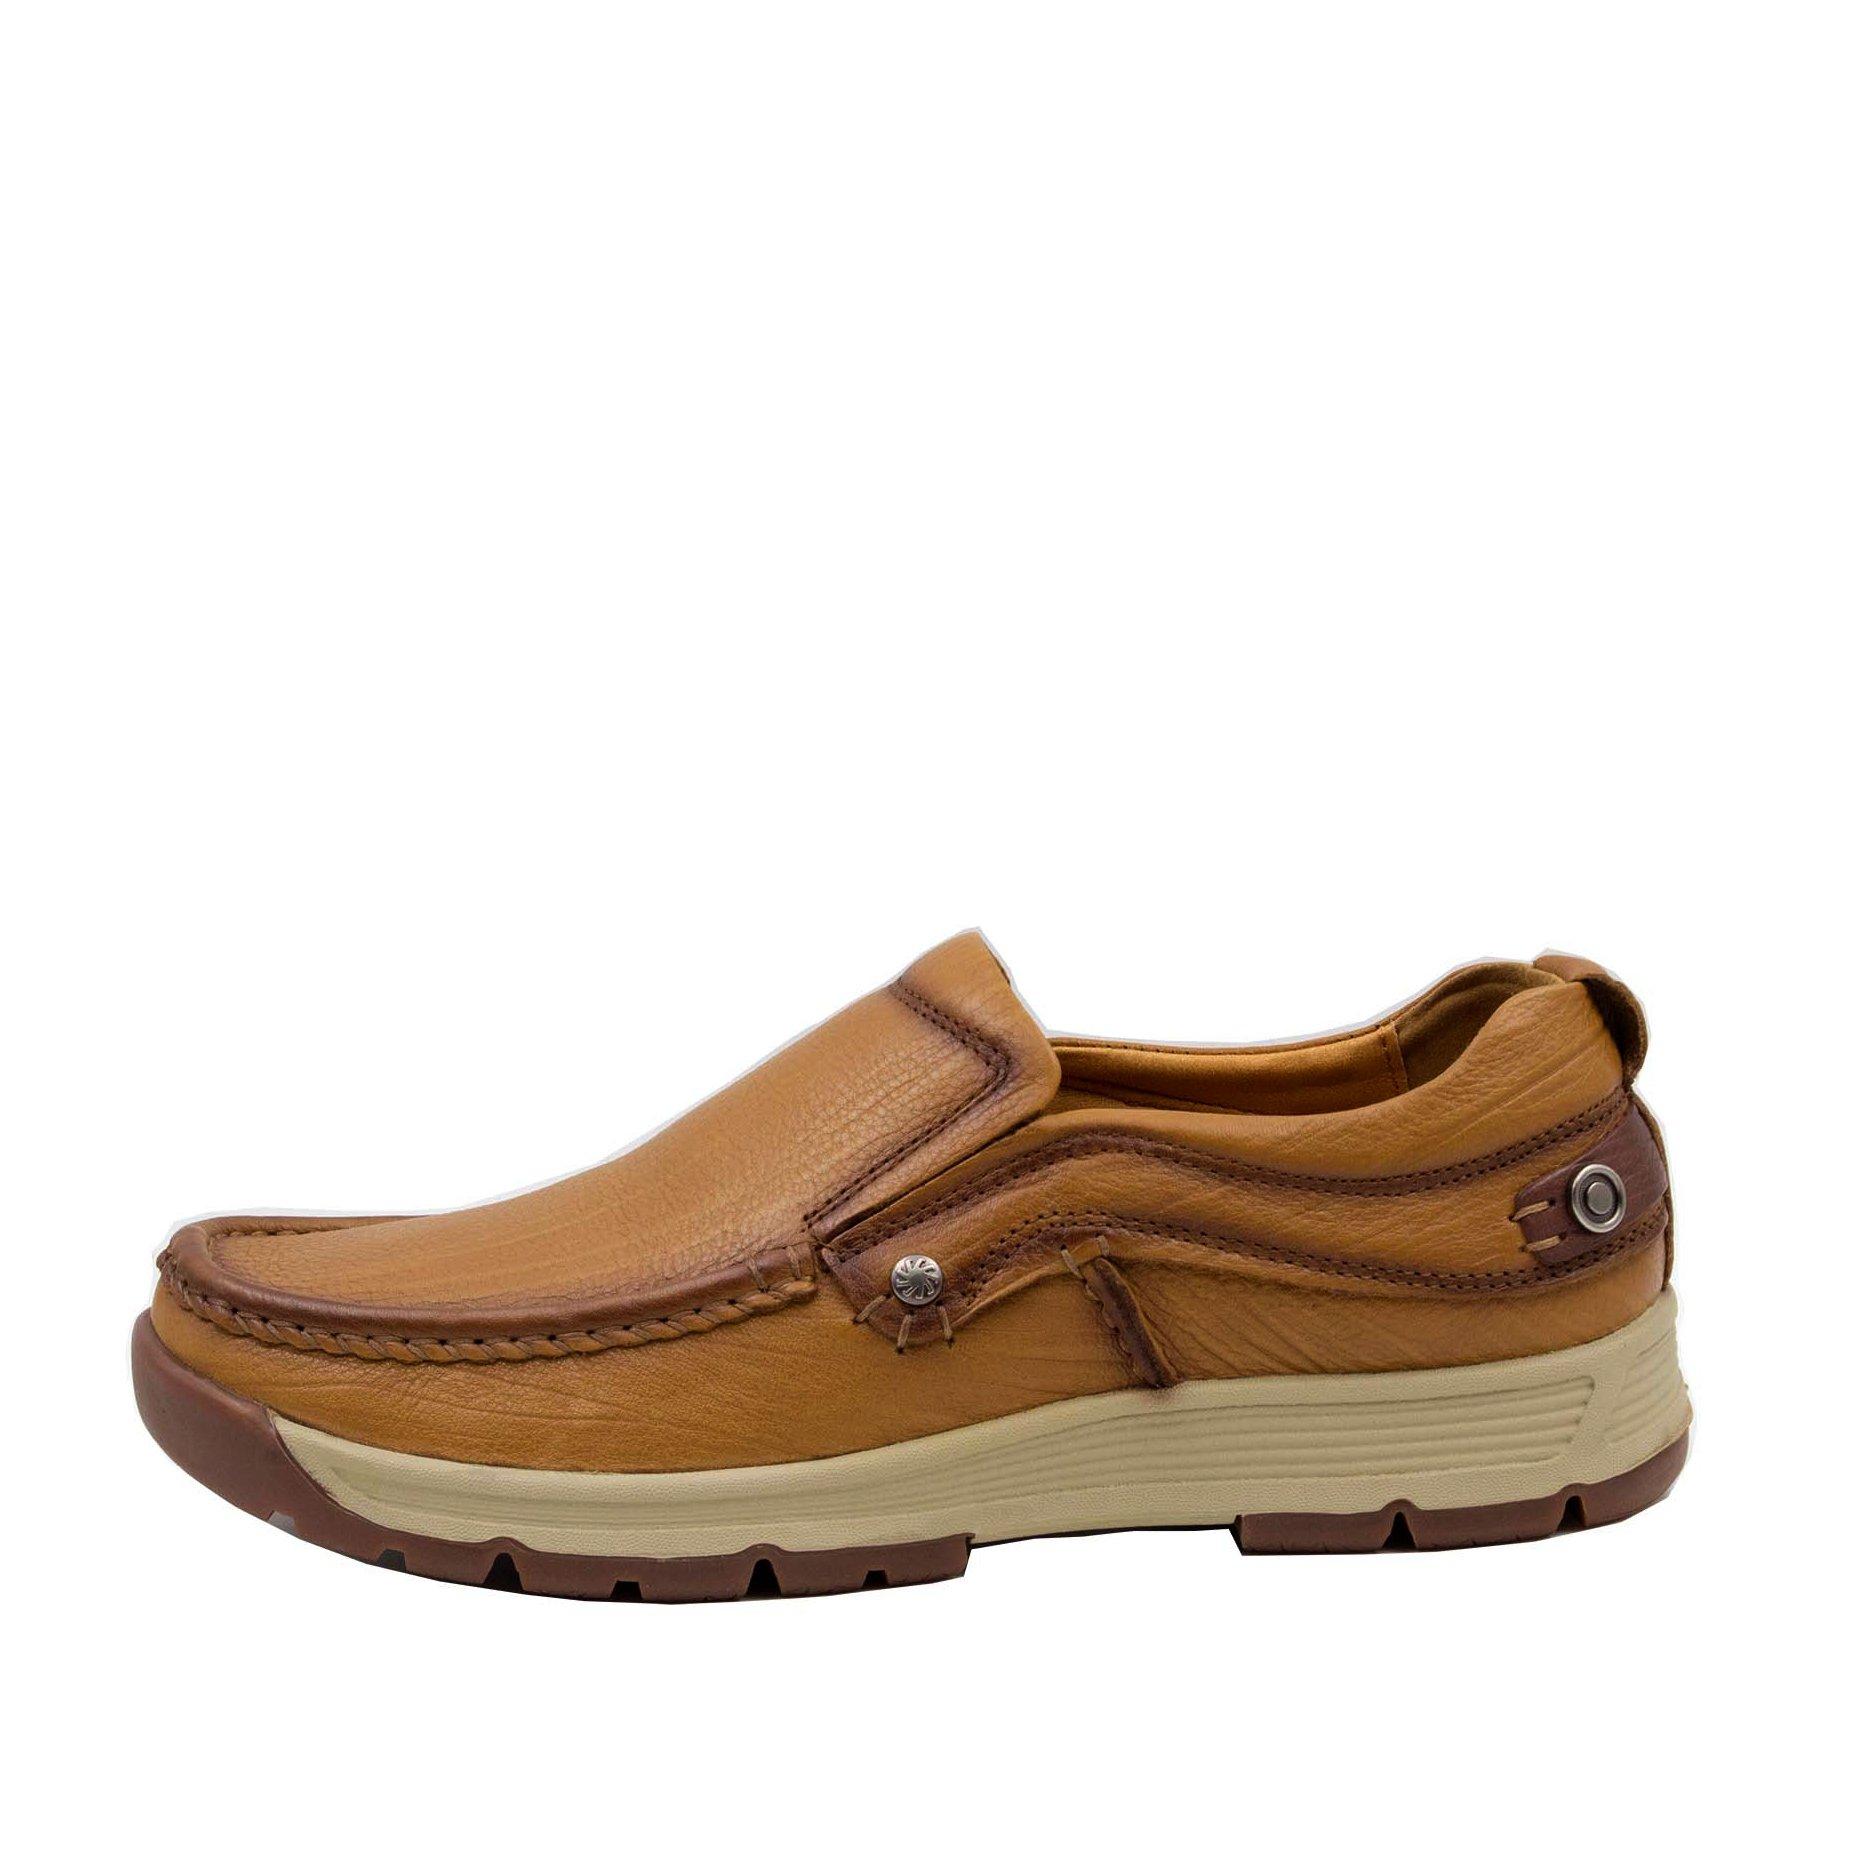 Giày Lười 7627R